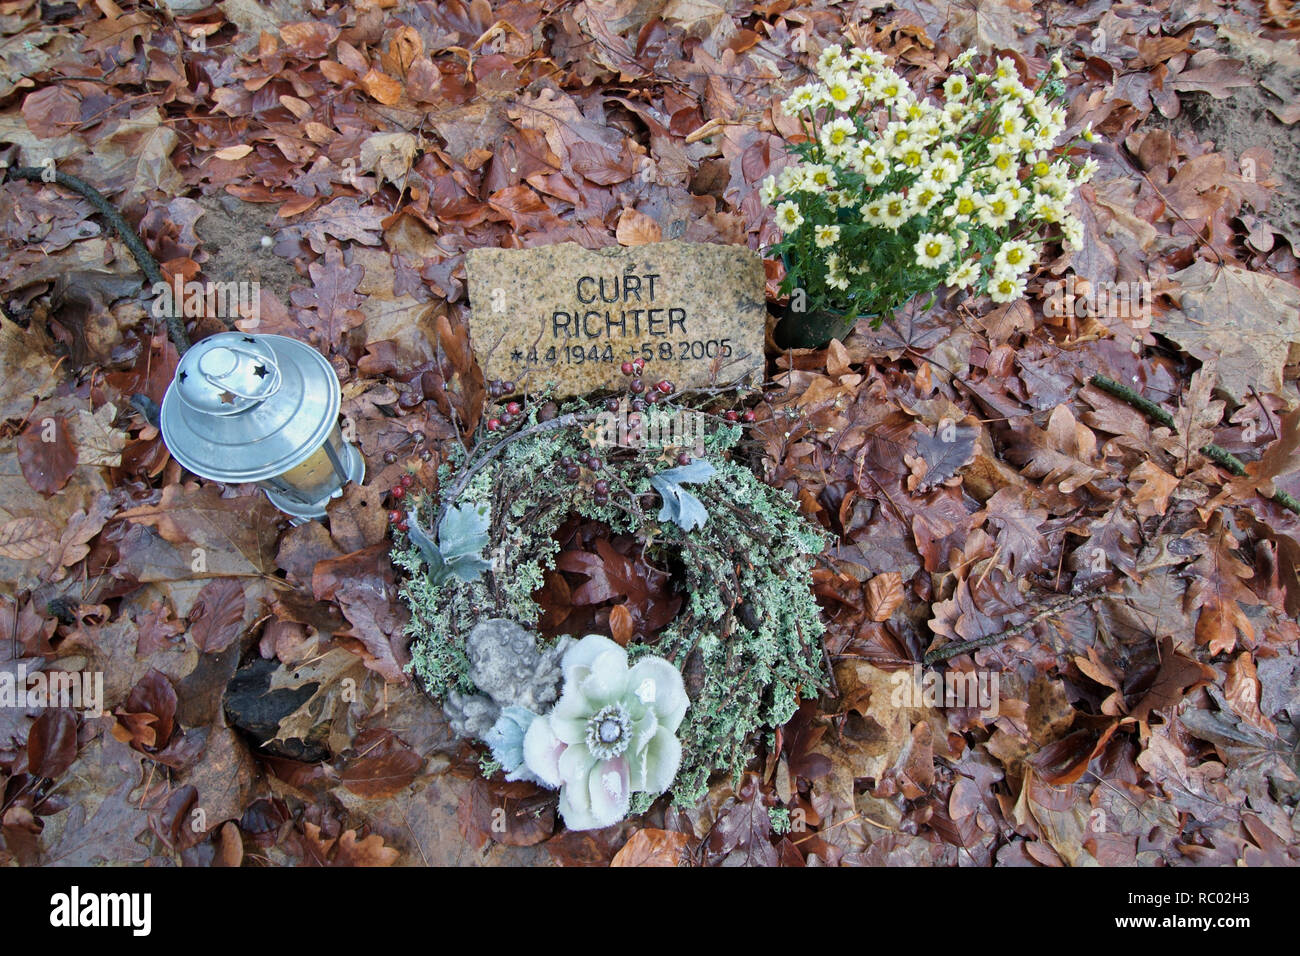 Südwest Kirchhof Stahnsdorf, Berlin, Deutschland, Europa   Southwest Churchyard Stahnsdorf, Berlin, Germany, Europe - Stock Image